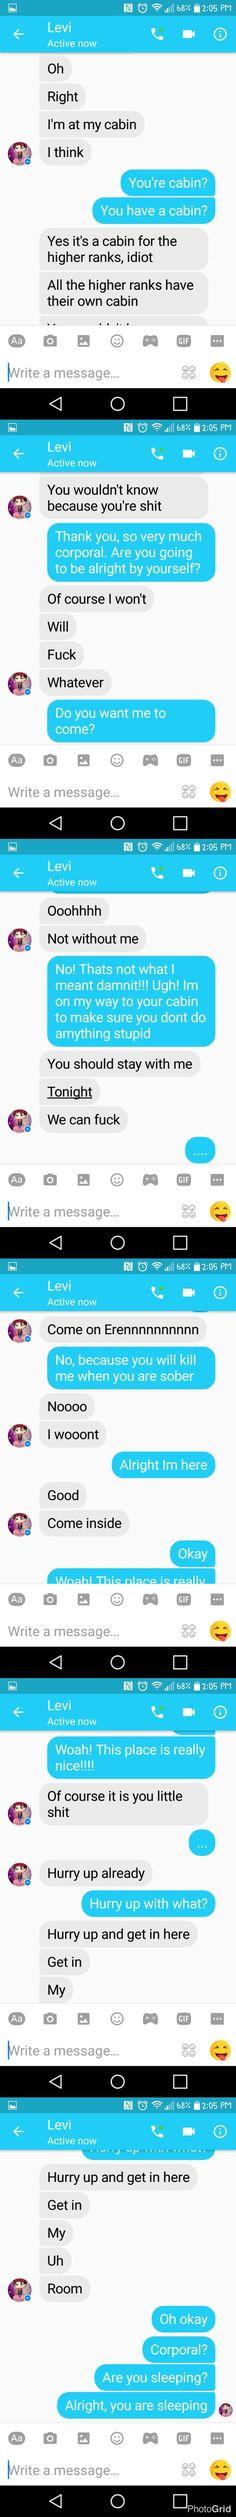 EreRi epic texts part 2 of 2